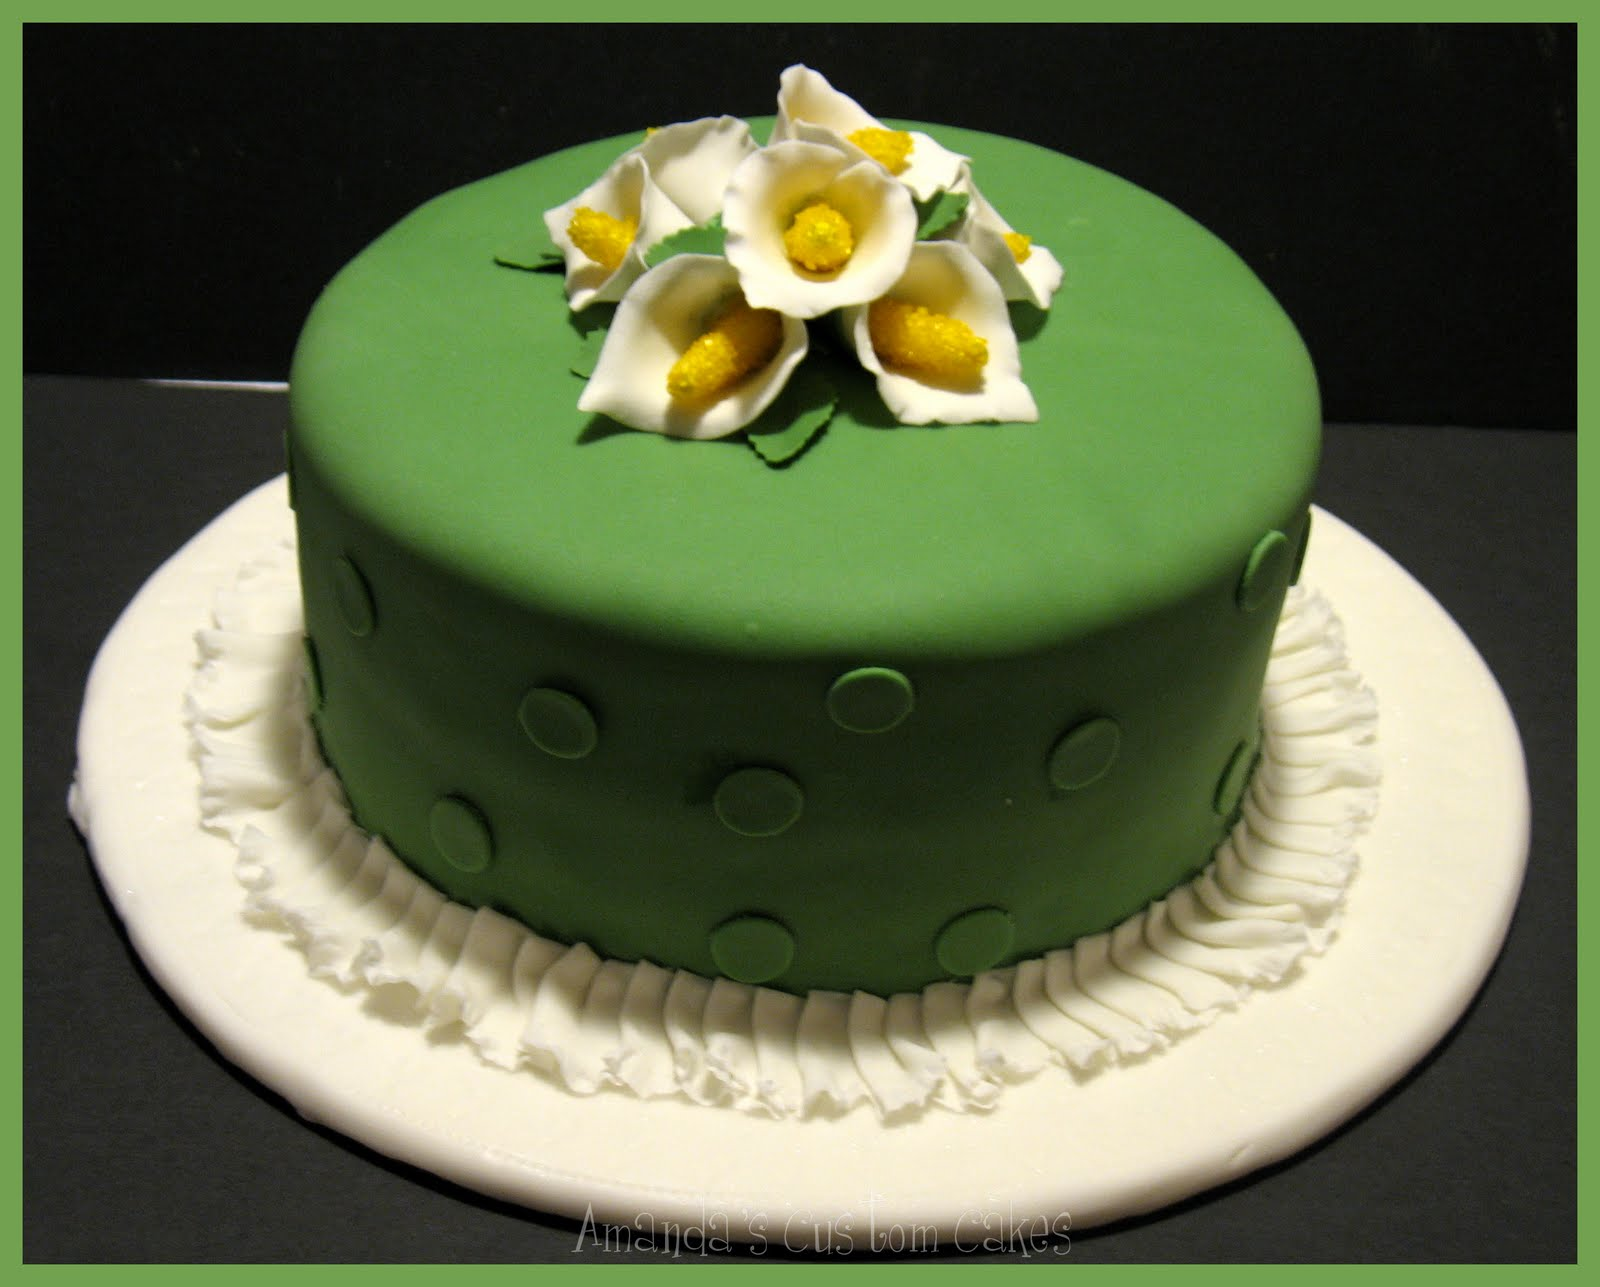 Wilton Cake Fondant Class : Amanda s Custom Cakes: Wilton Fondant & Gumpaste Course ...